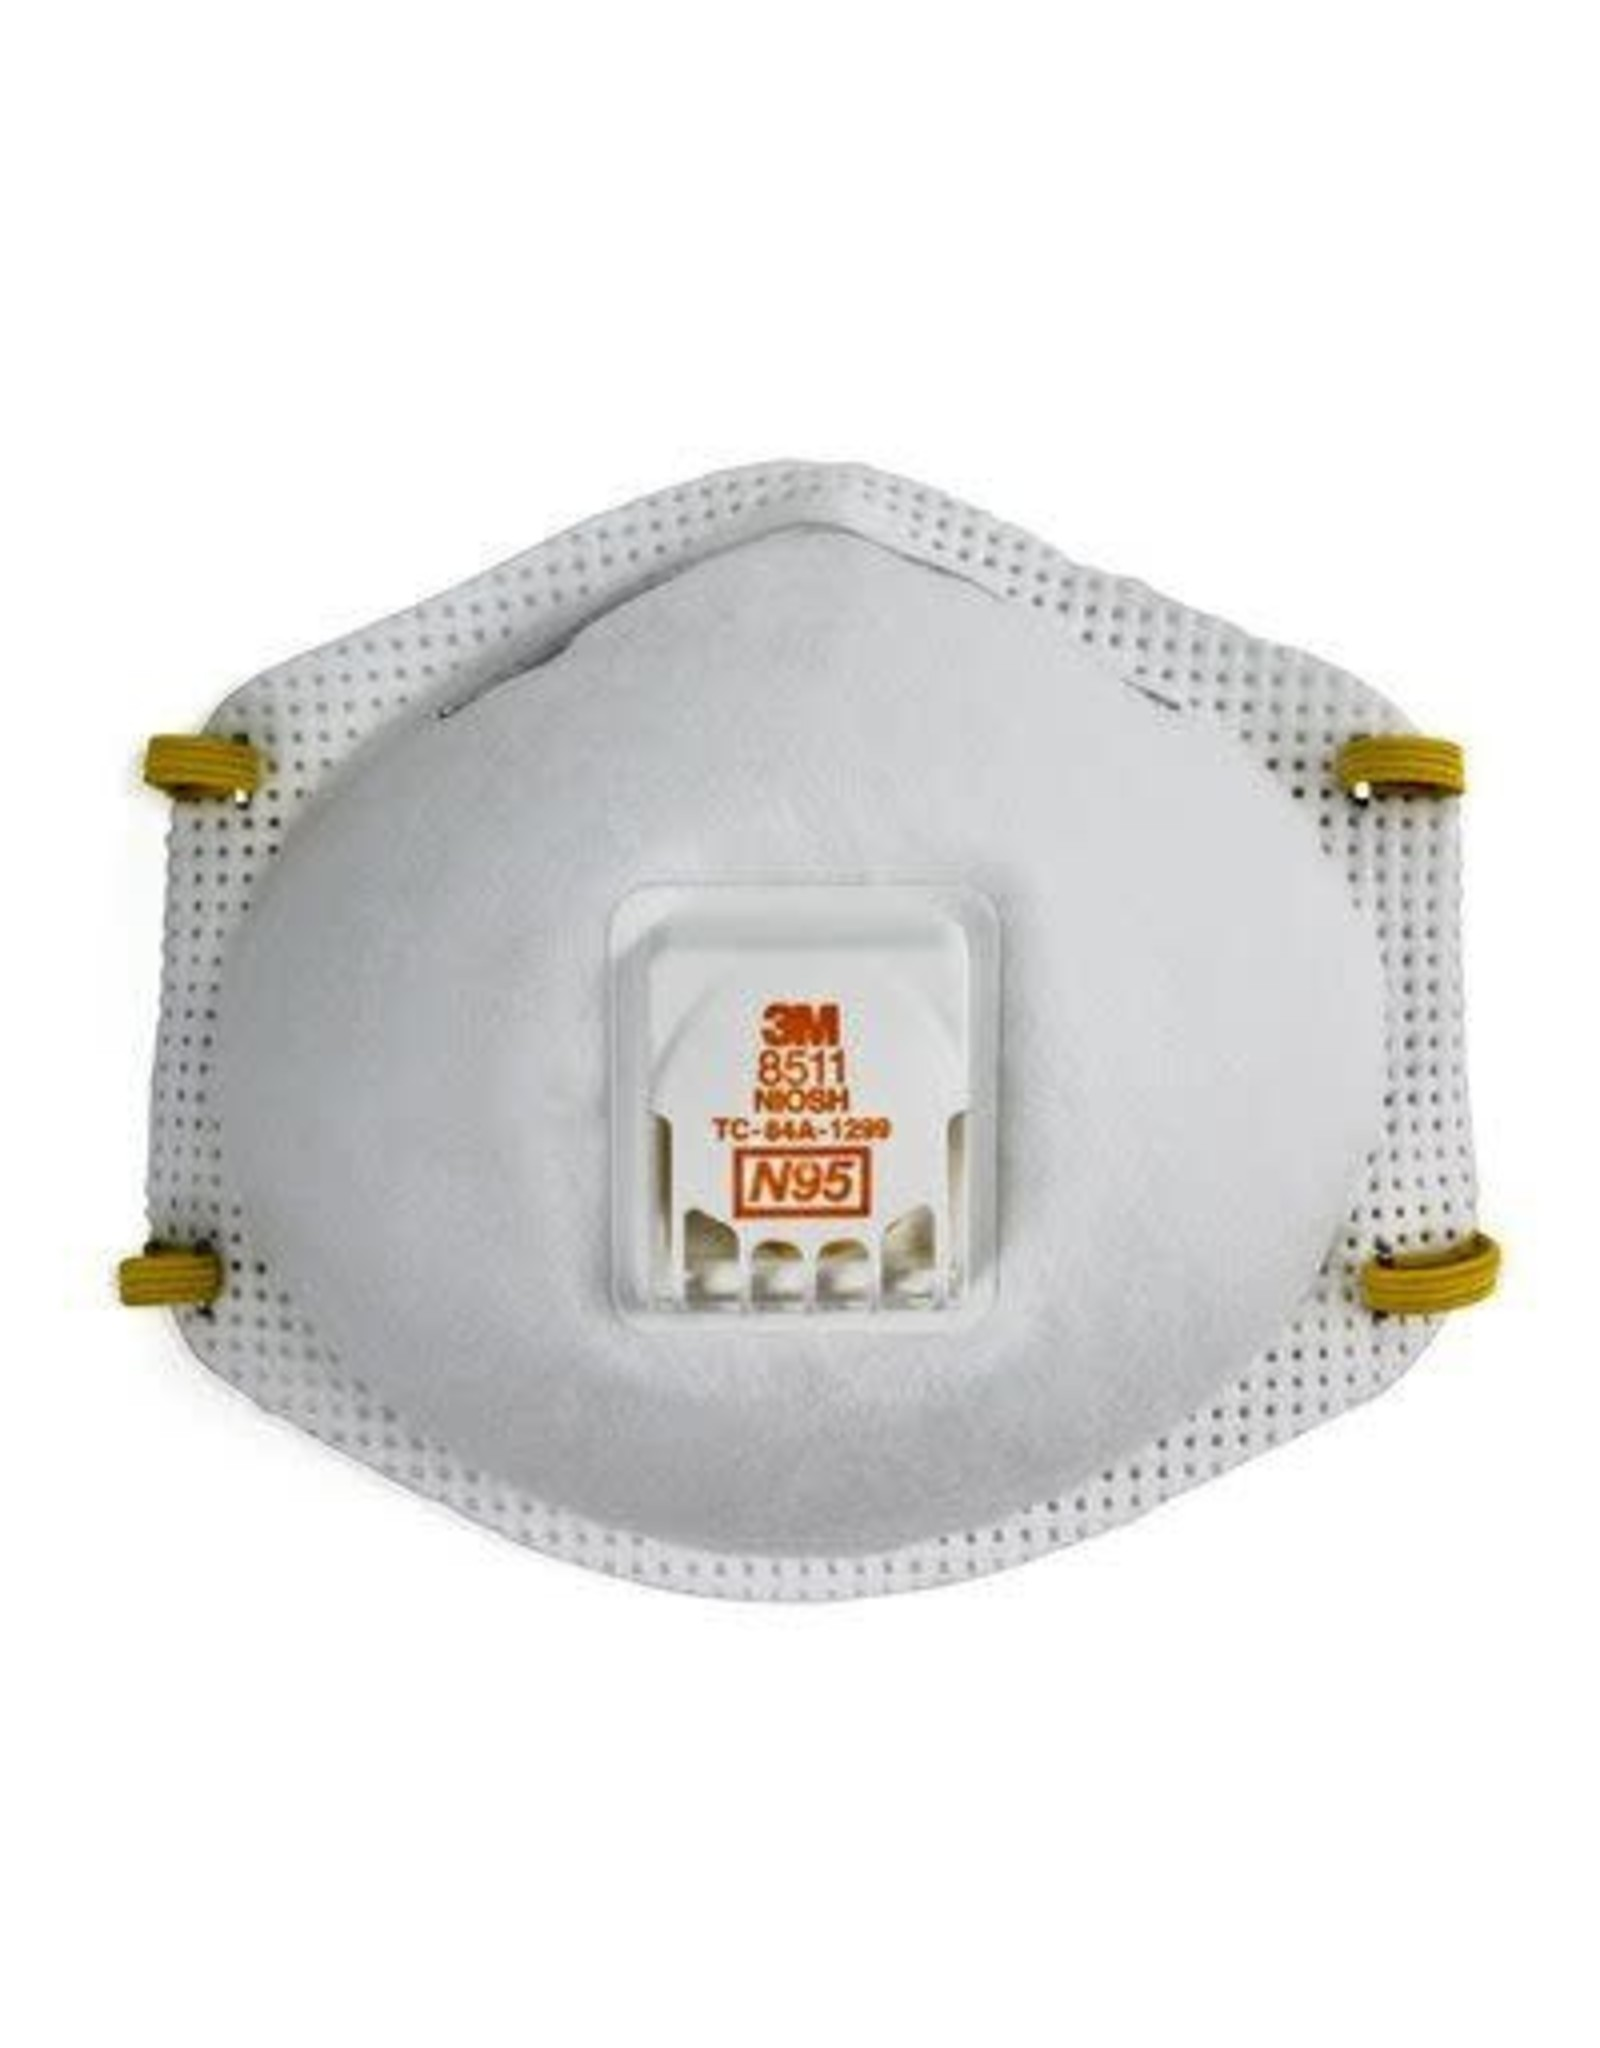 3M™ Particulate Respirator